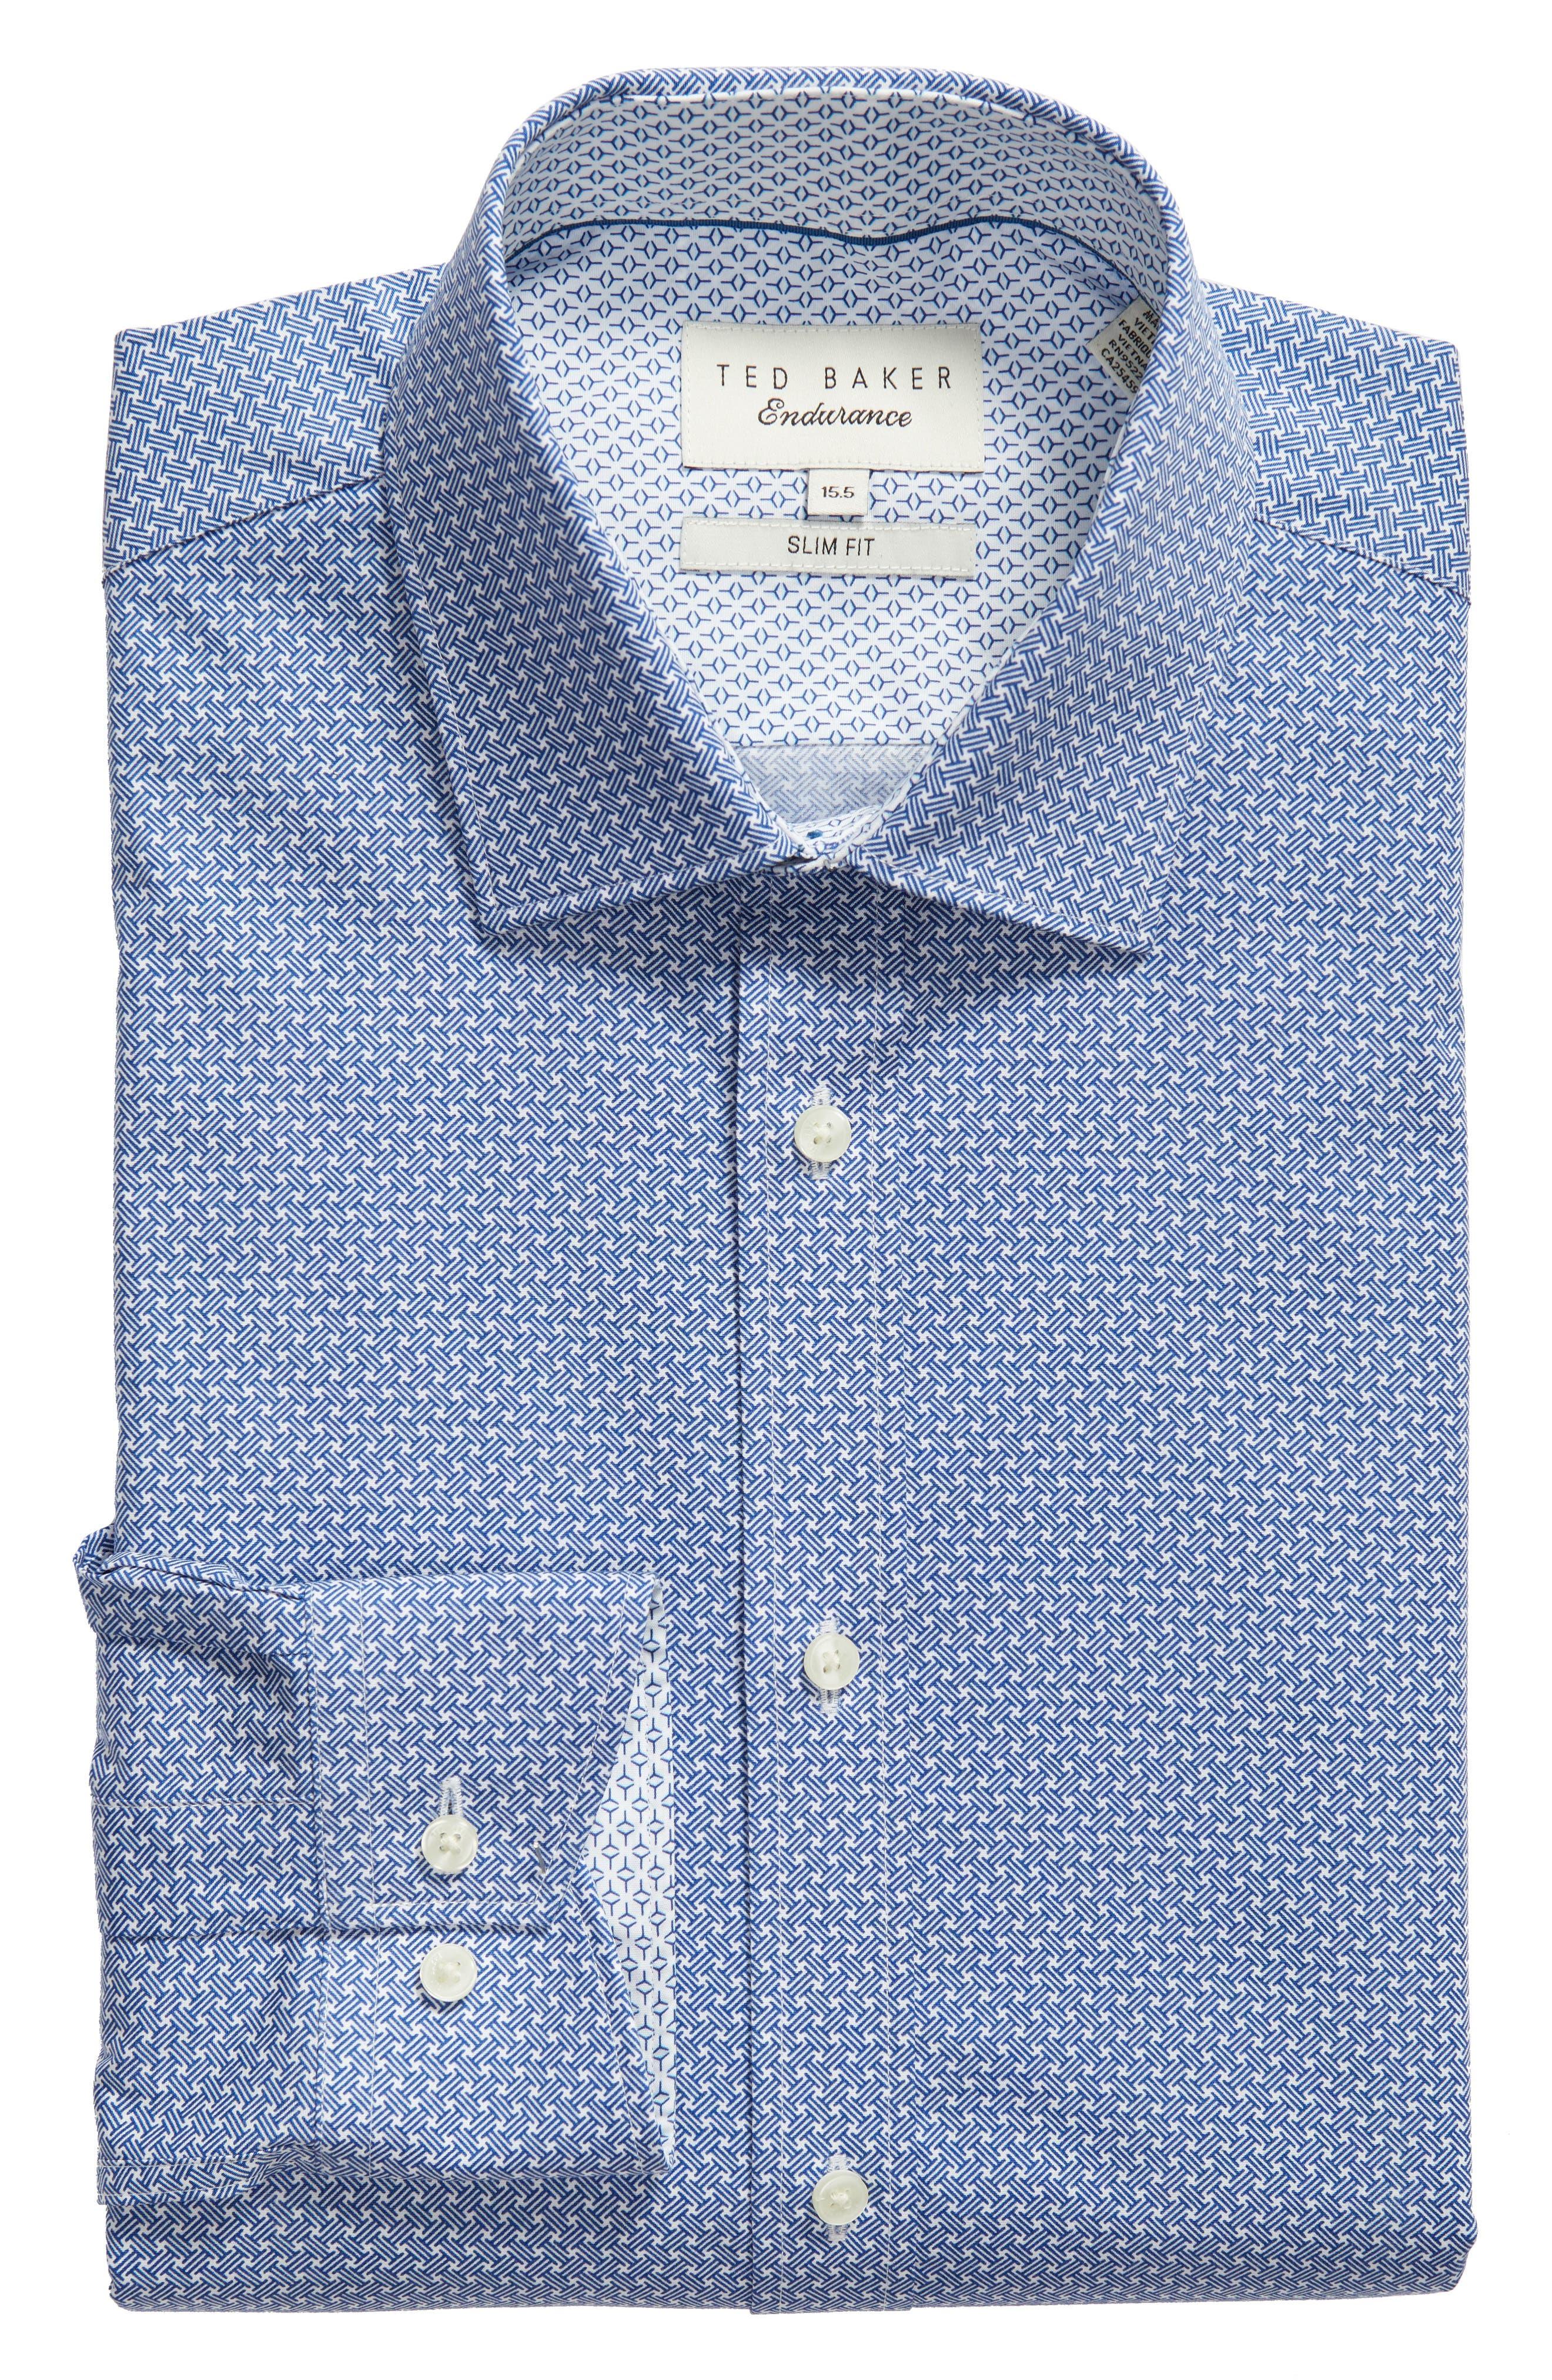 Rugber Slim Fit Print Dress Shirt,                             Alternate thumbnail 5, color,                             BLUE